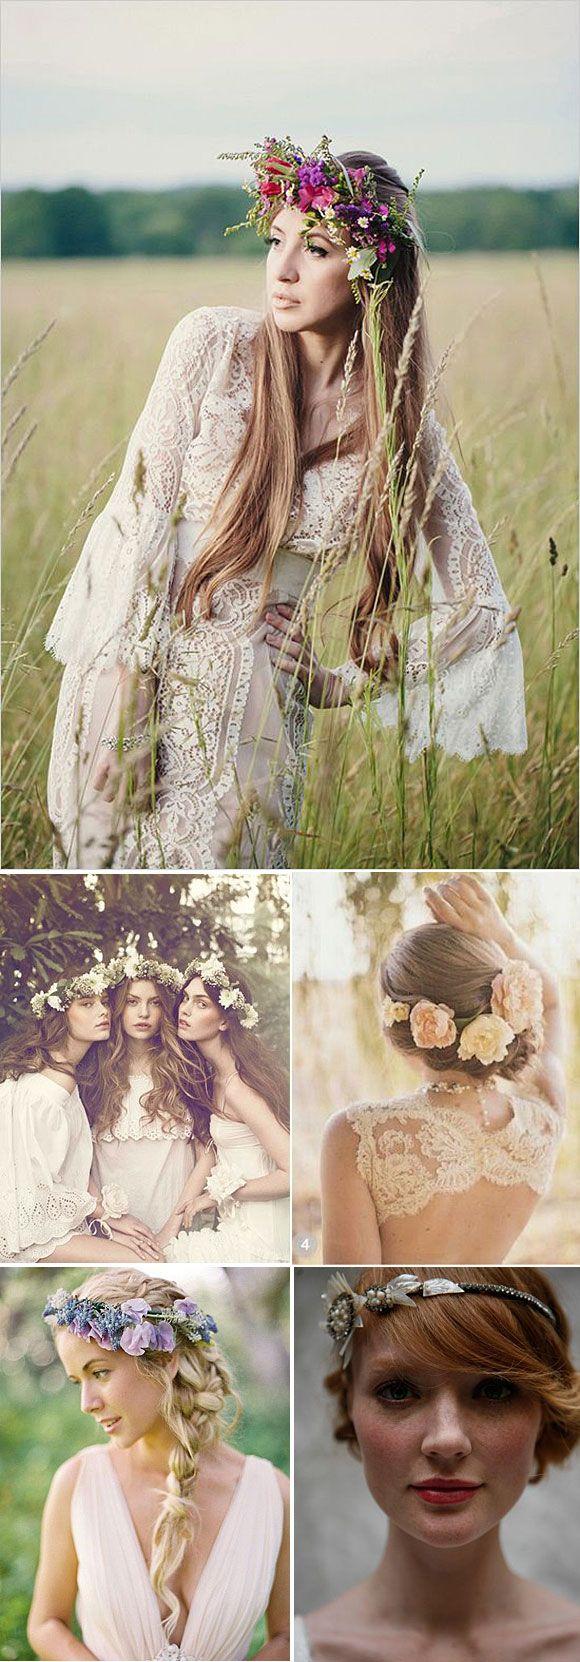 Coronas de flores y diademas para Novias Boho CHIC